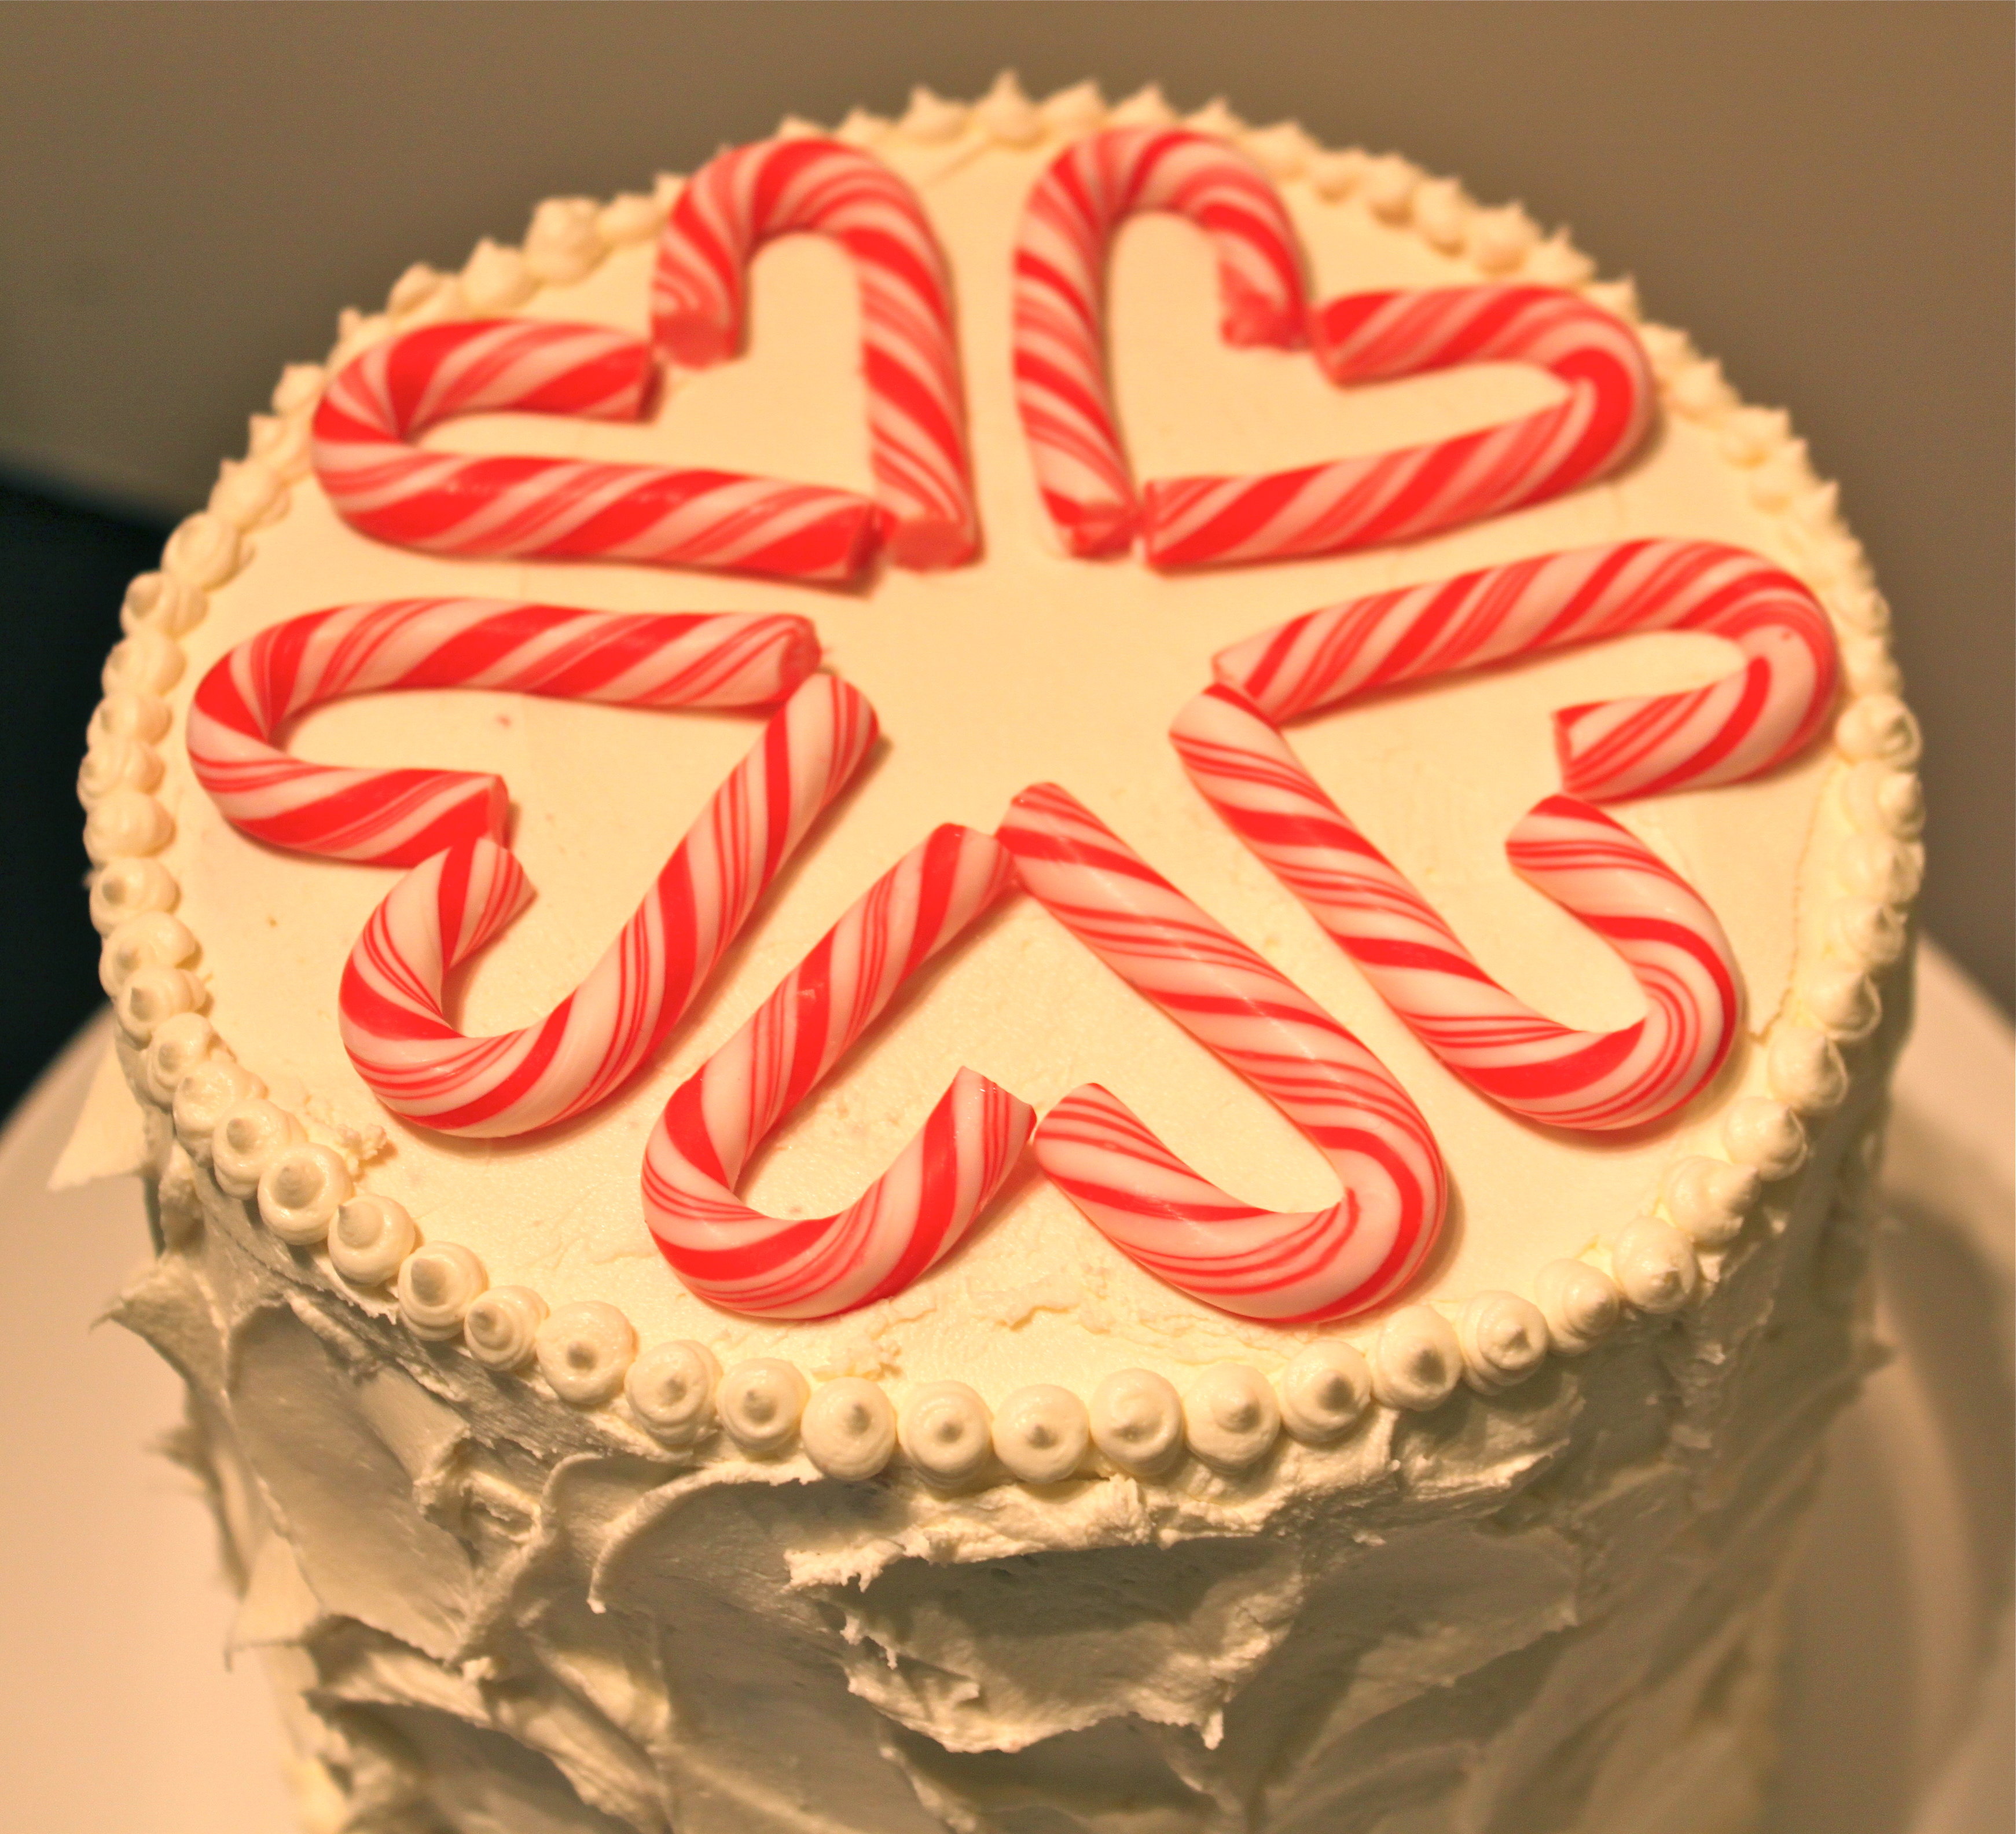 Candy Cane Sled Gift Idea